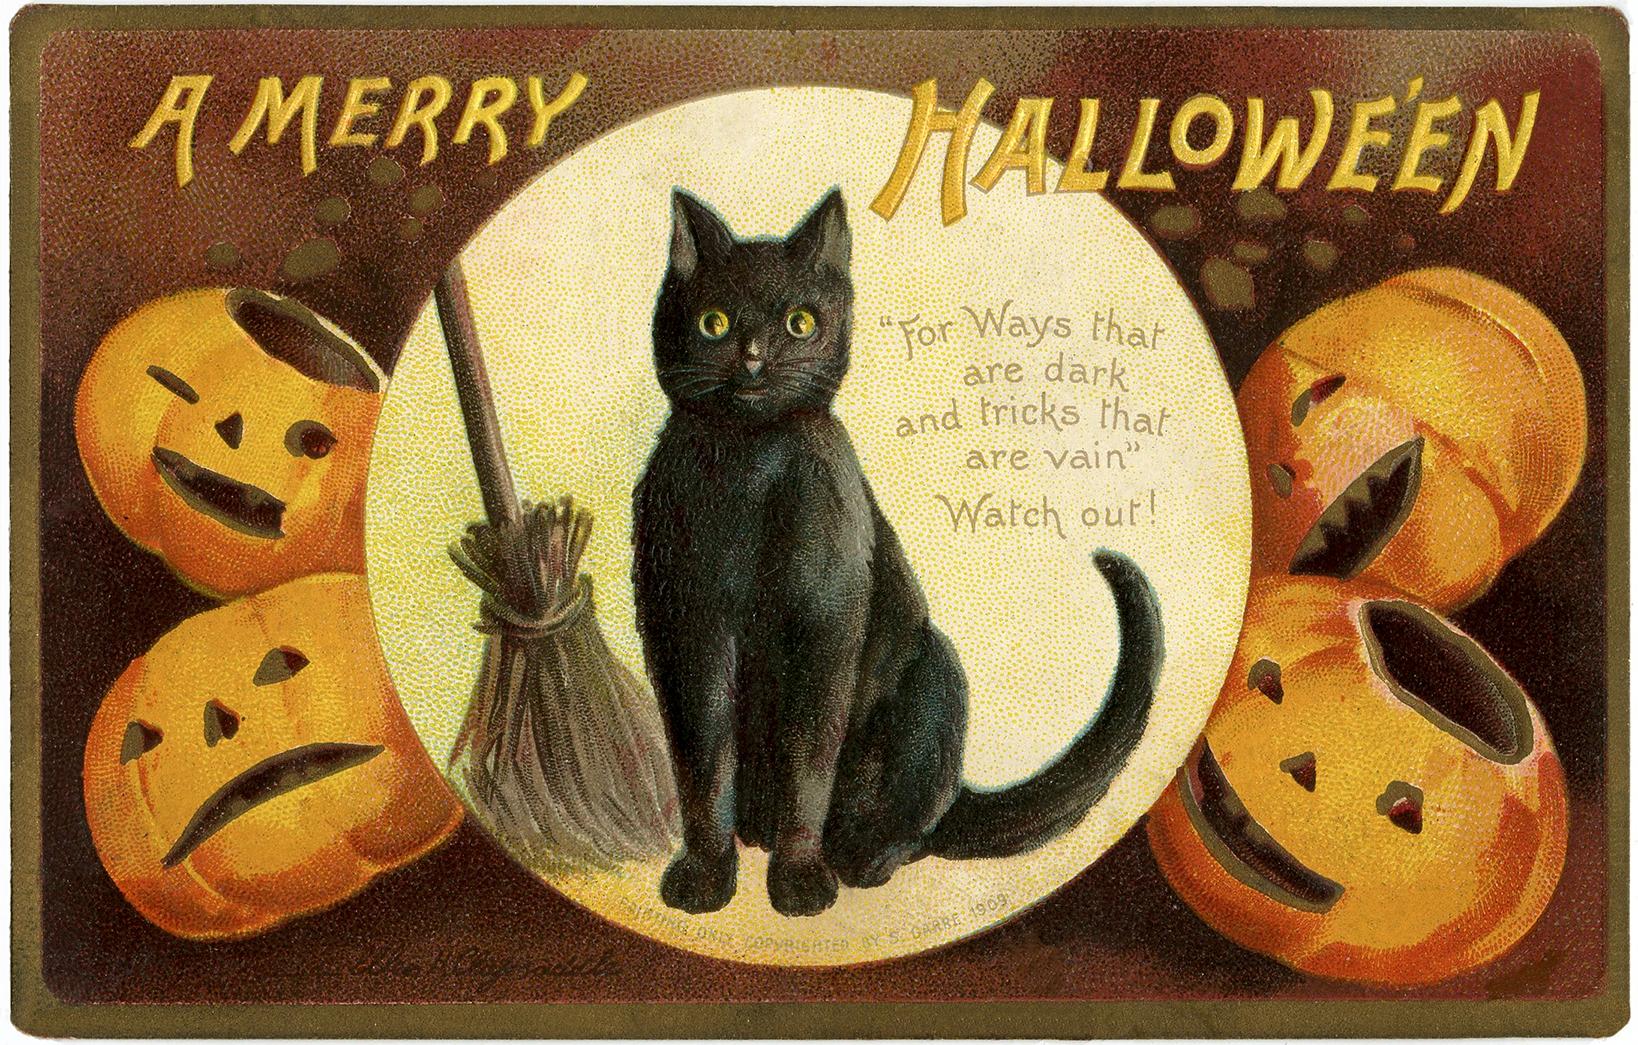 10 Extremely Creepy Vintage Halloween Costume Photos | Beauty A